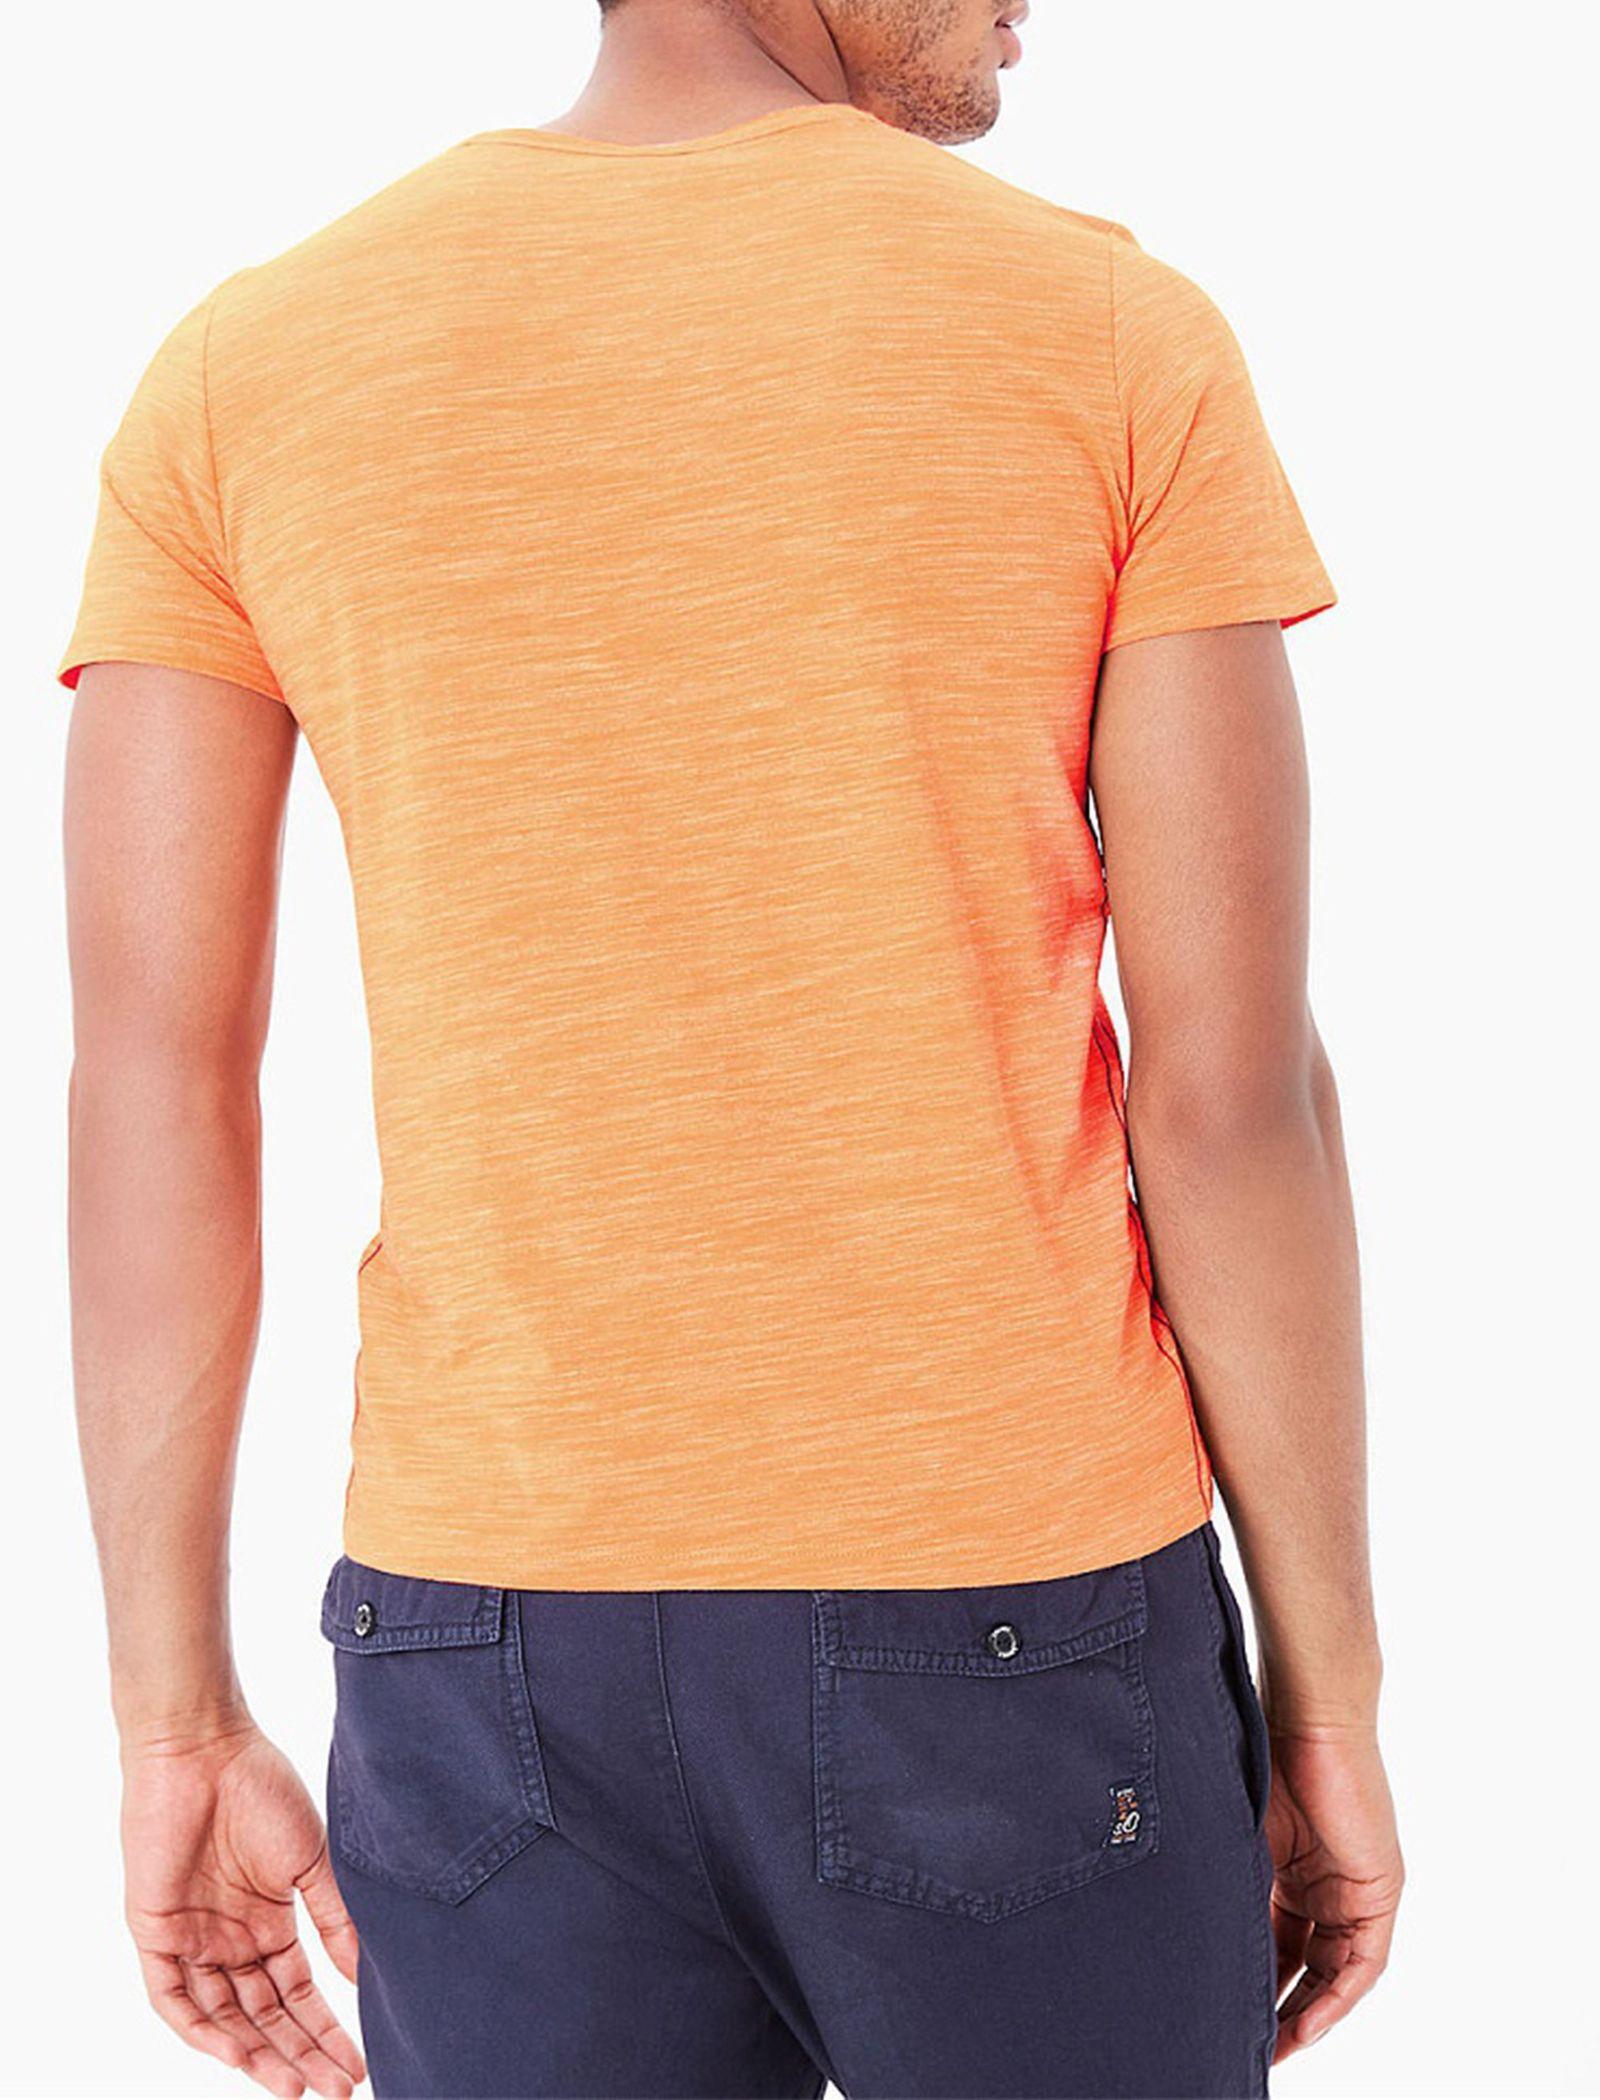 تی شرت نخی یقه هفت مردانه - اس.اولیور - نارنجي روشن - 2